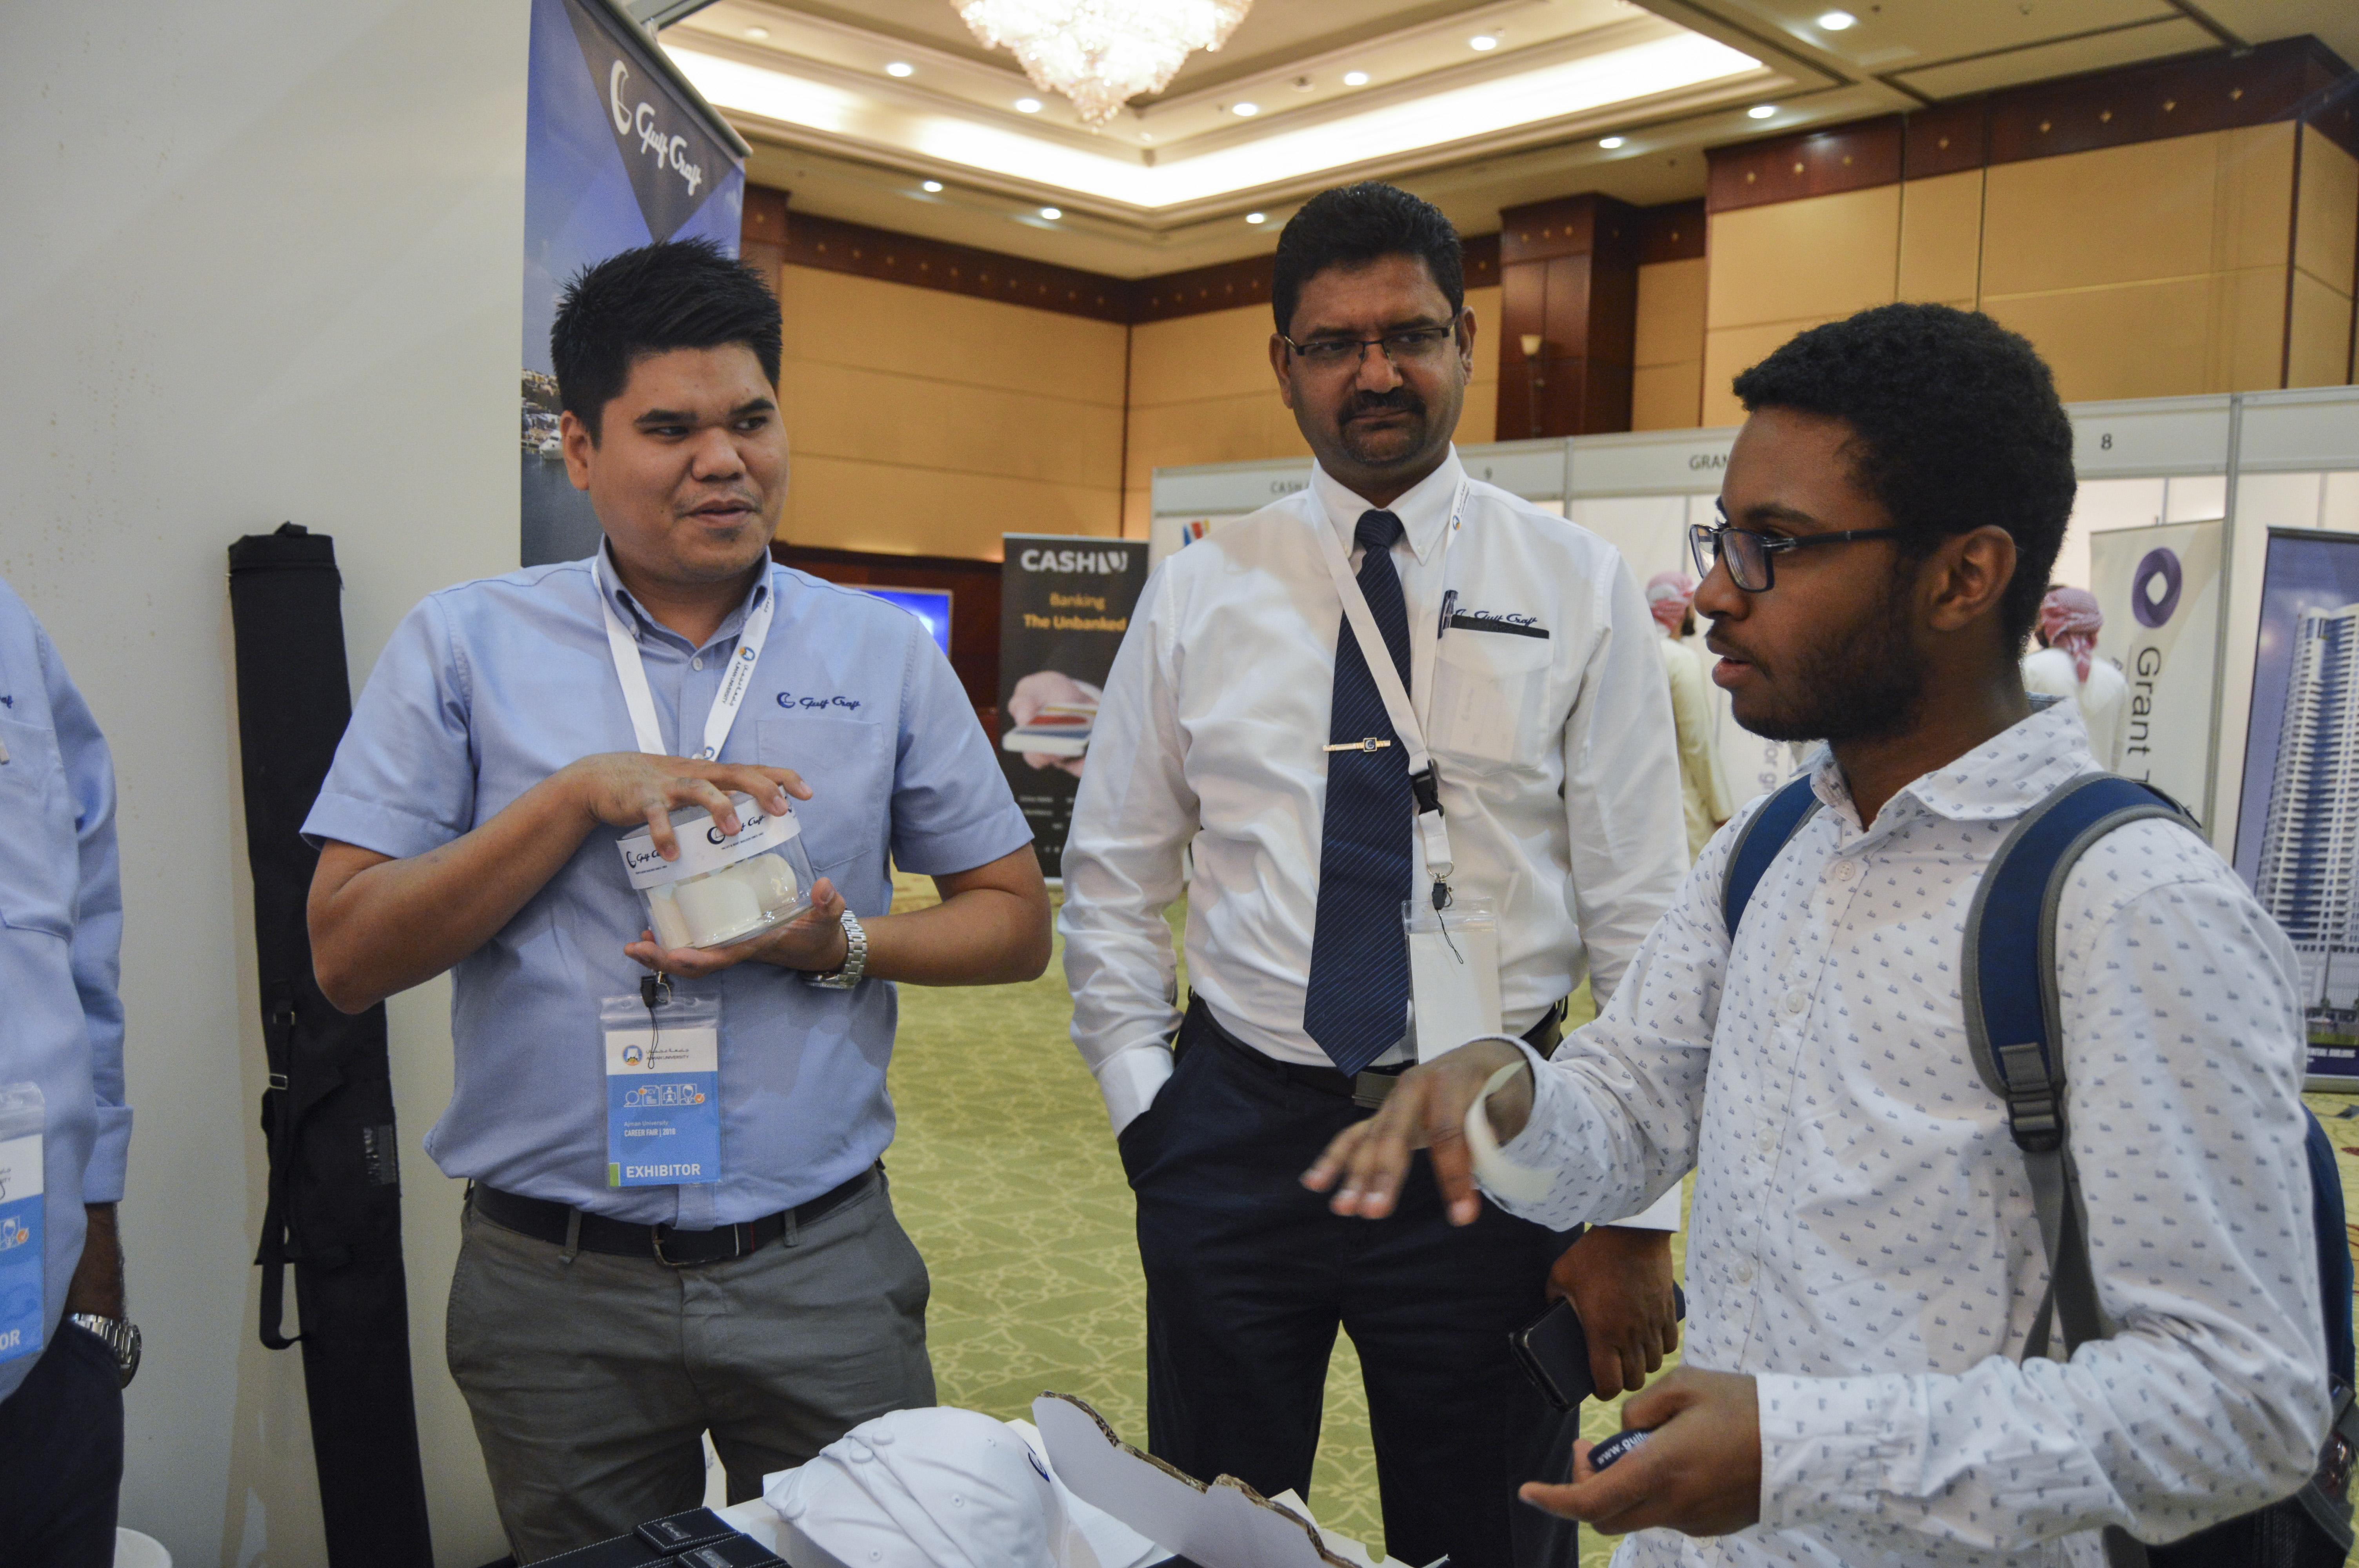 Gulf Craft at Ajman University Job Fair 2018 (6).jpg